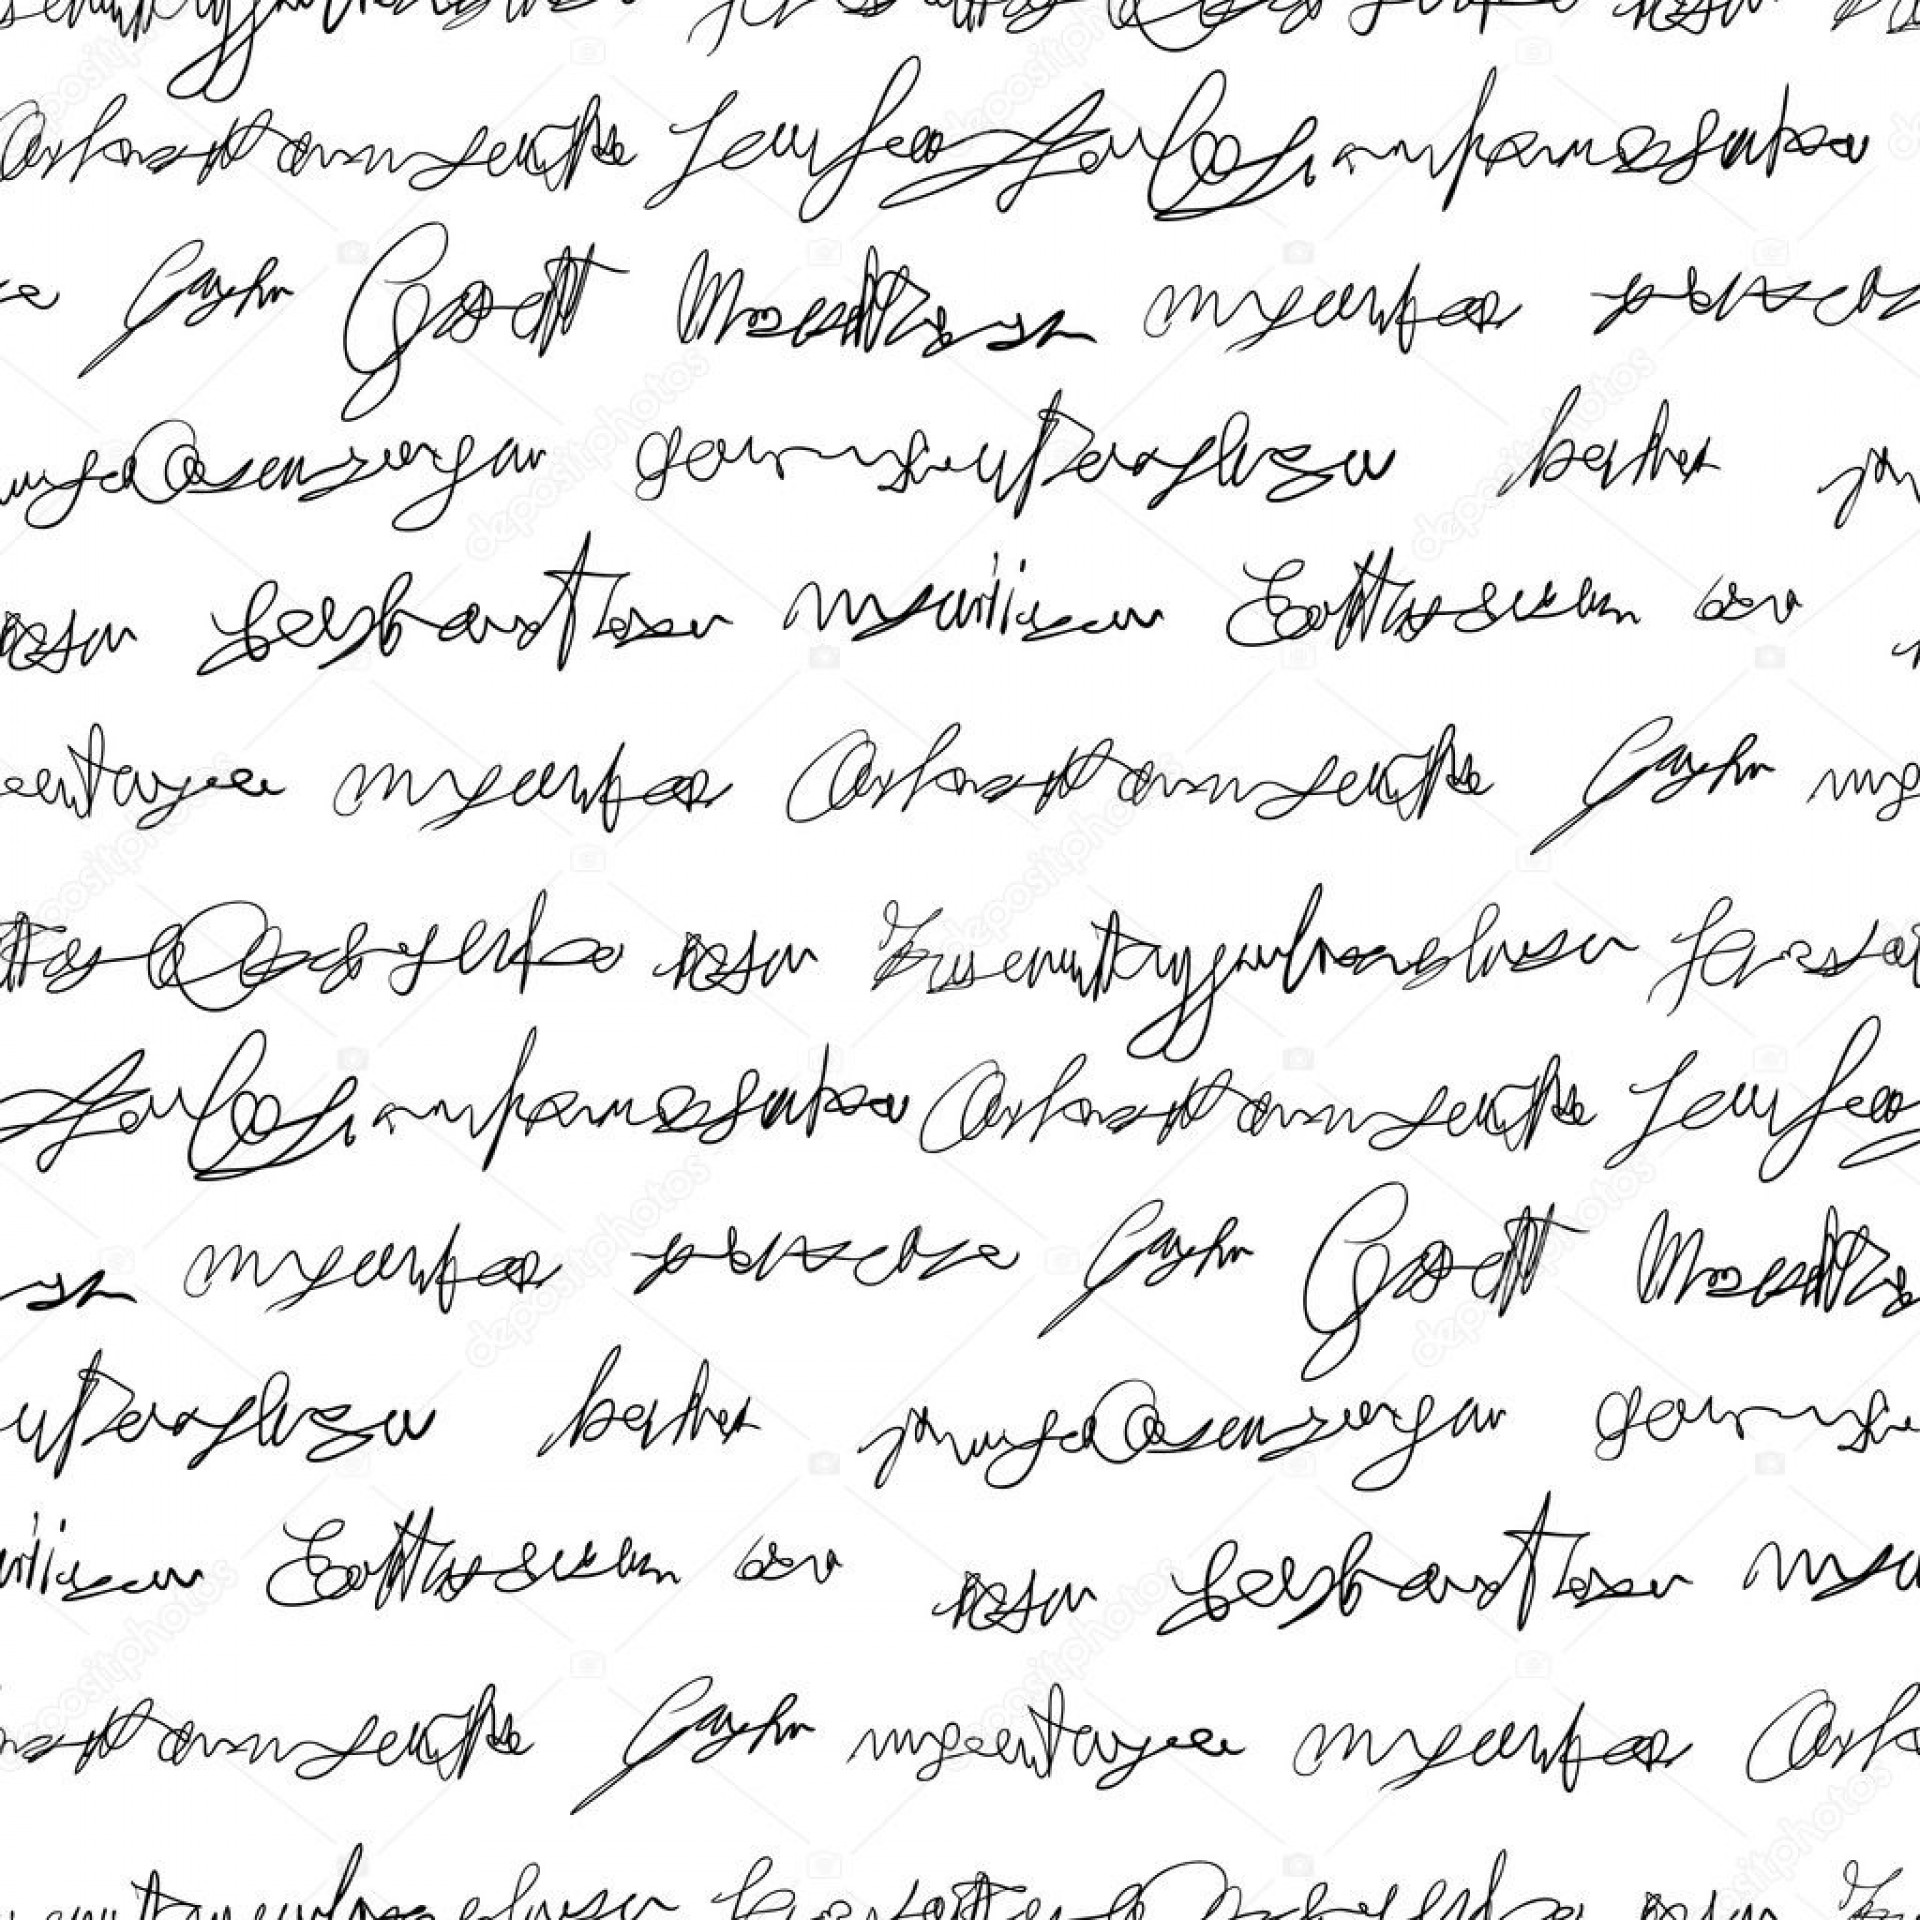 006 Essay Example Money Fake Writer Pixels Write Essays For Article Will Depositphotos 4972594 Seamless Writing Te Uk Jobs Best Uni College Scholarship 1920